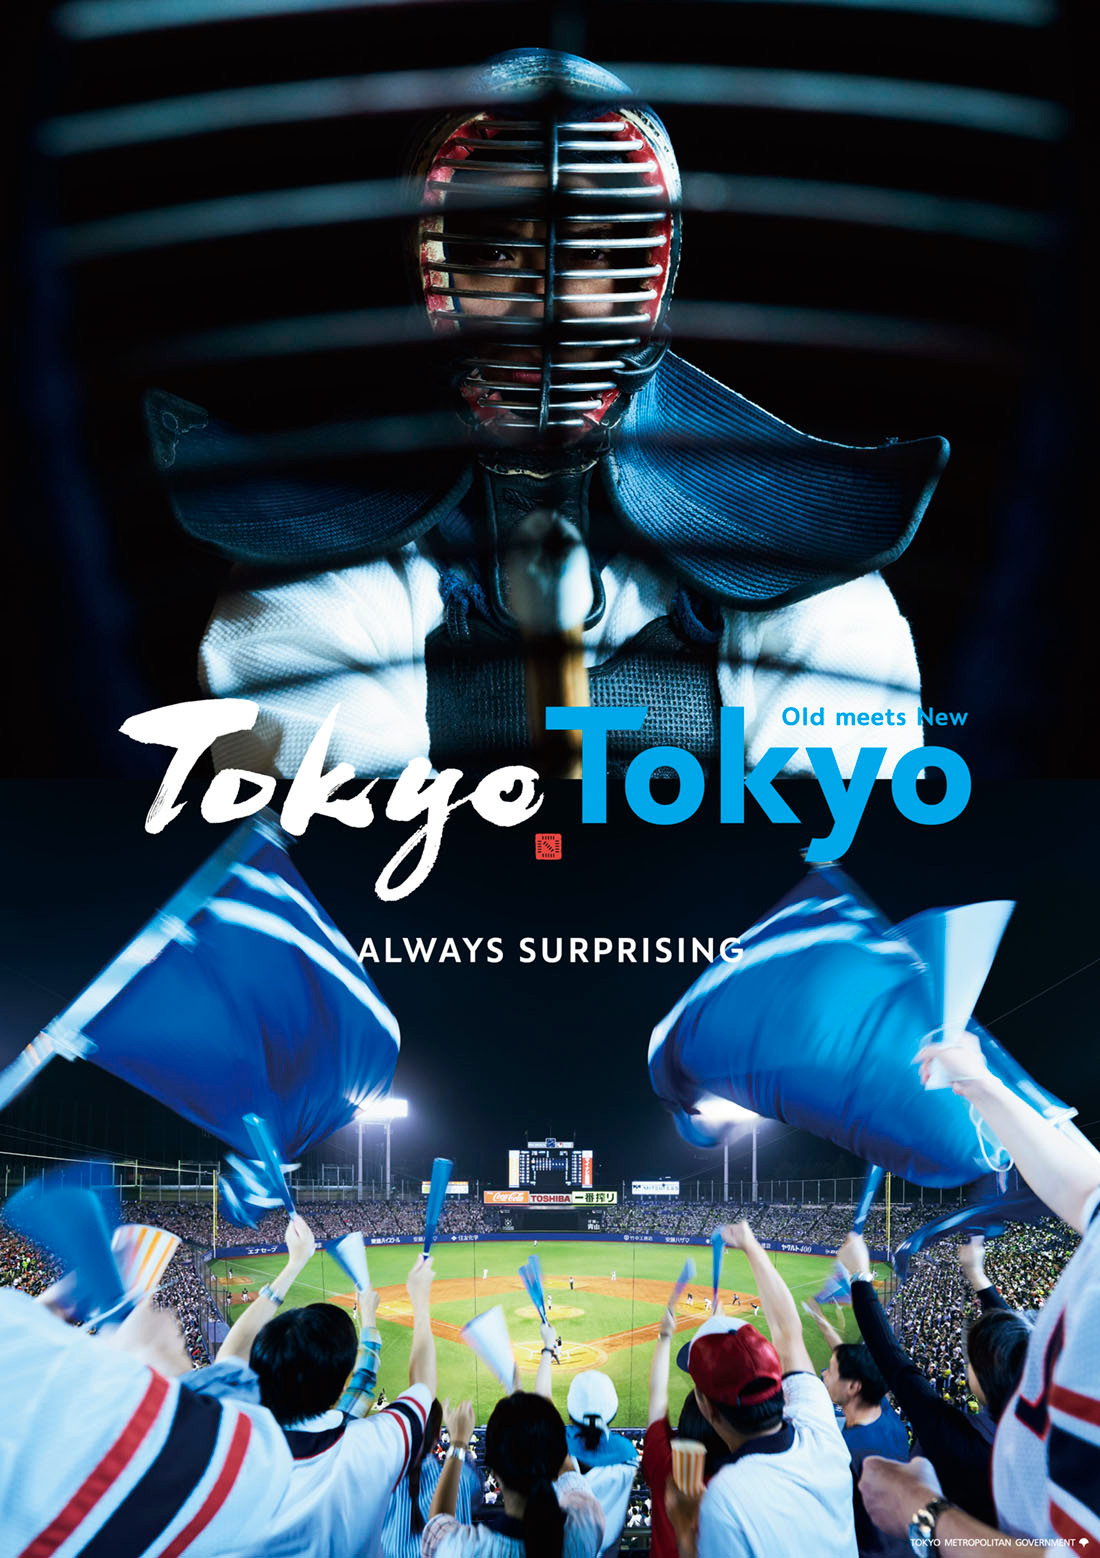 TokyoTokyo_douhen_A1_0207_nyuko_ol-03.jp